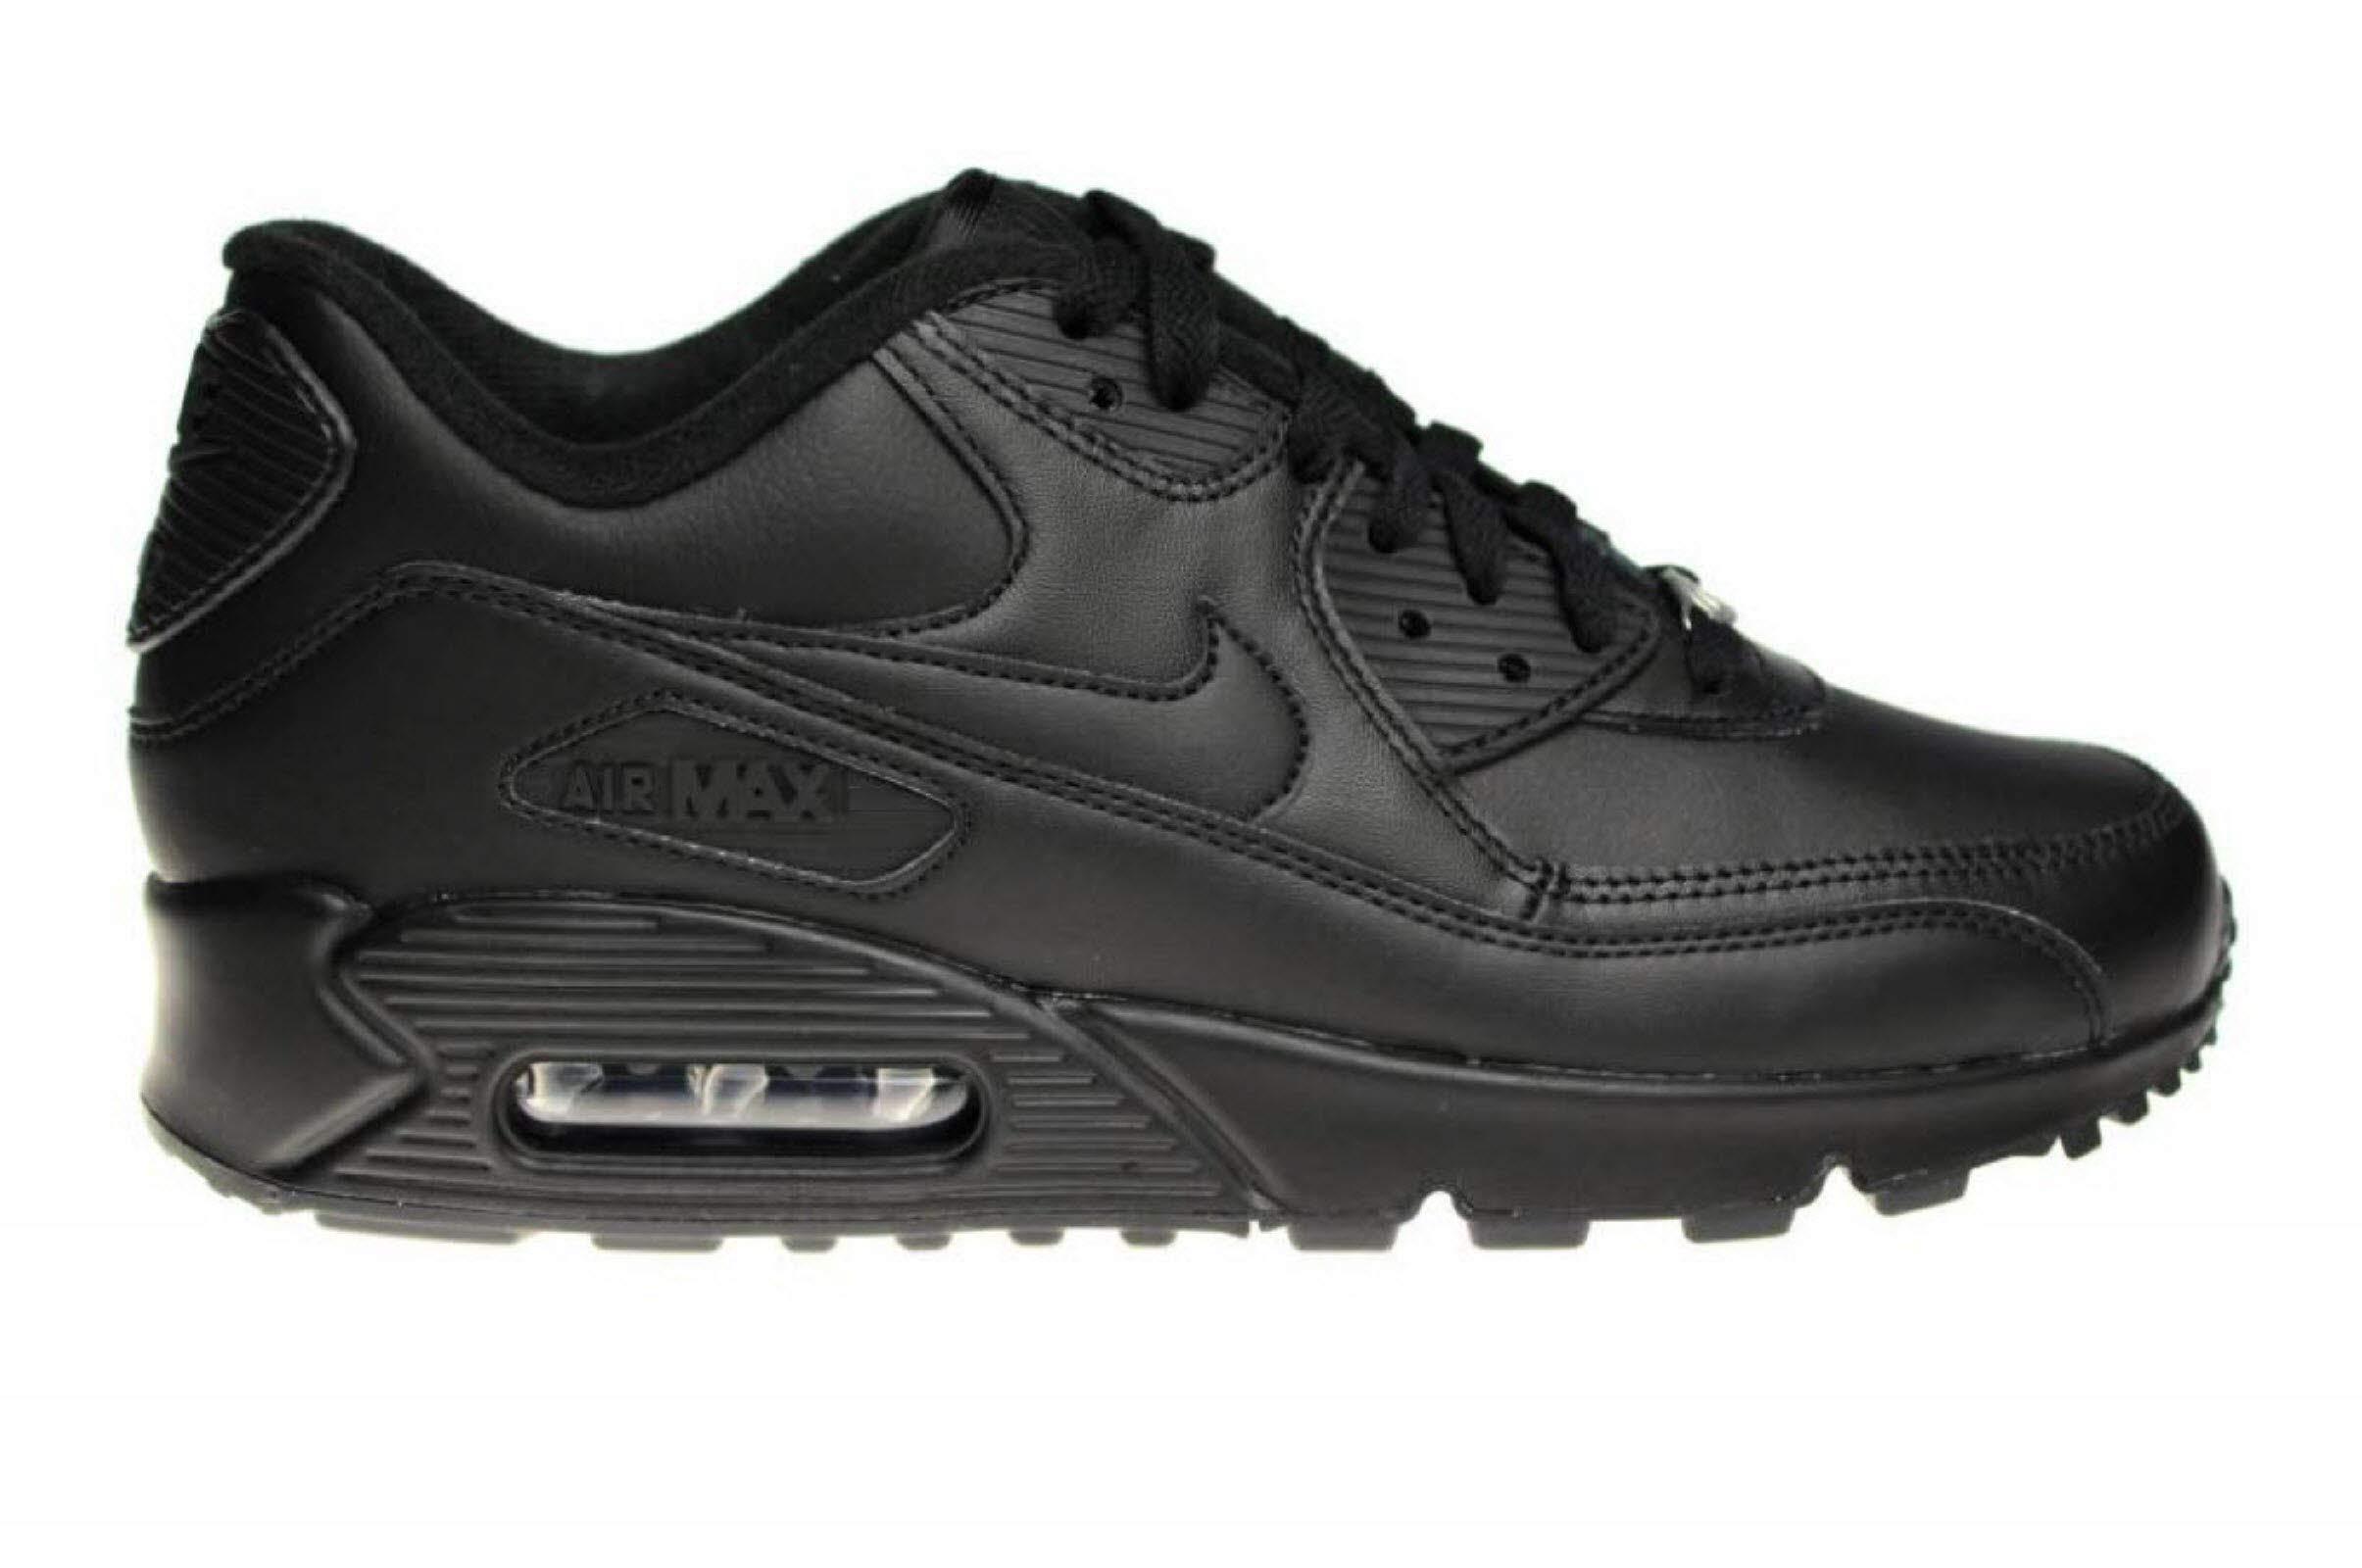 Herren Schwarz Nike Air Max 90 Leather Running Schuhe